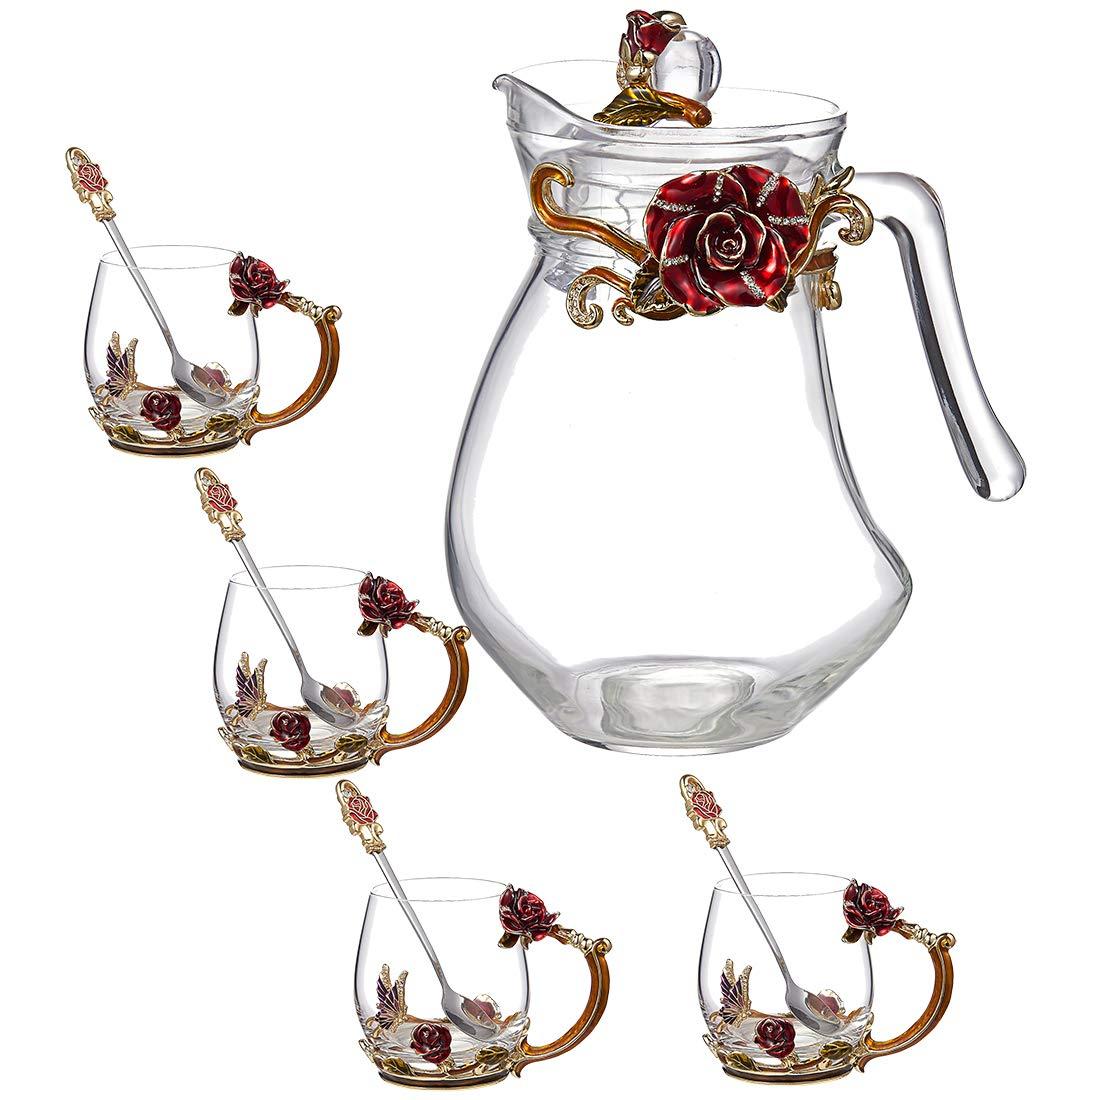 Tea Mug Set of 5, Crystal Tea Cup Coffee Mug Set 4x 11oz Tea Mugs 1x 45oz Water Kettle with Enamels